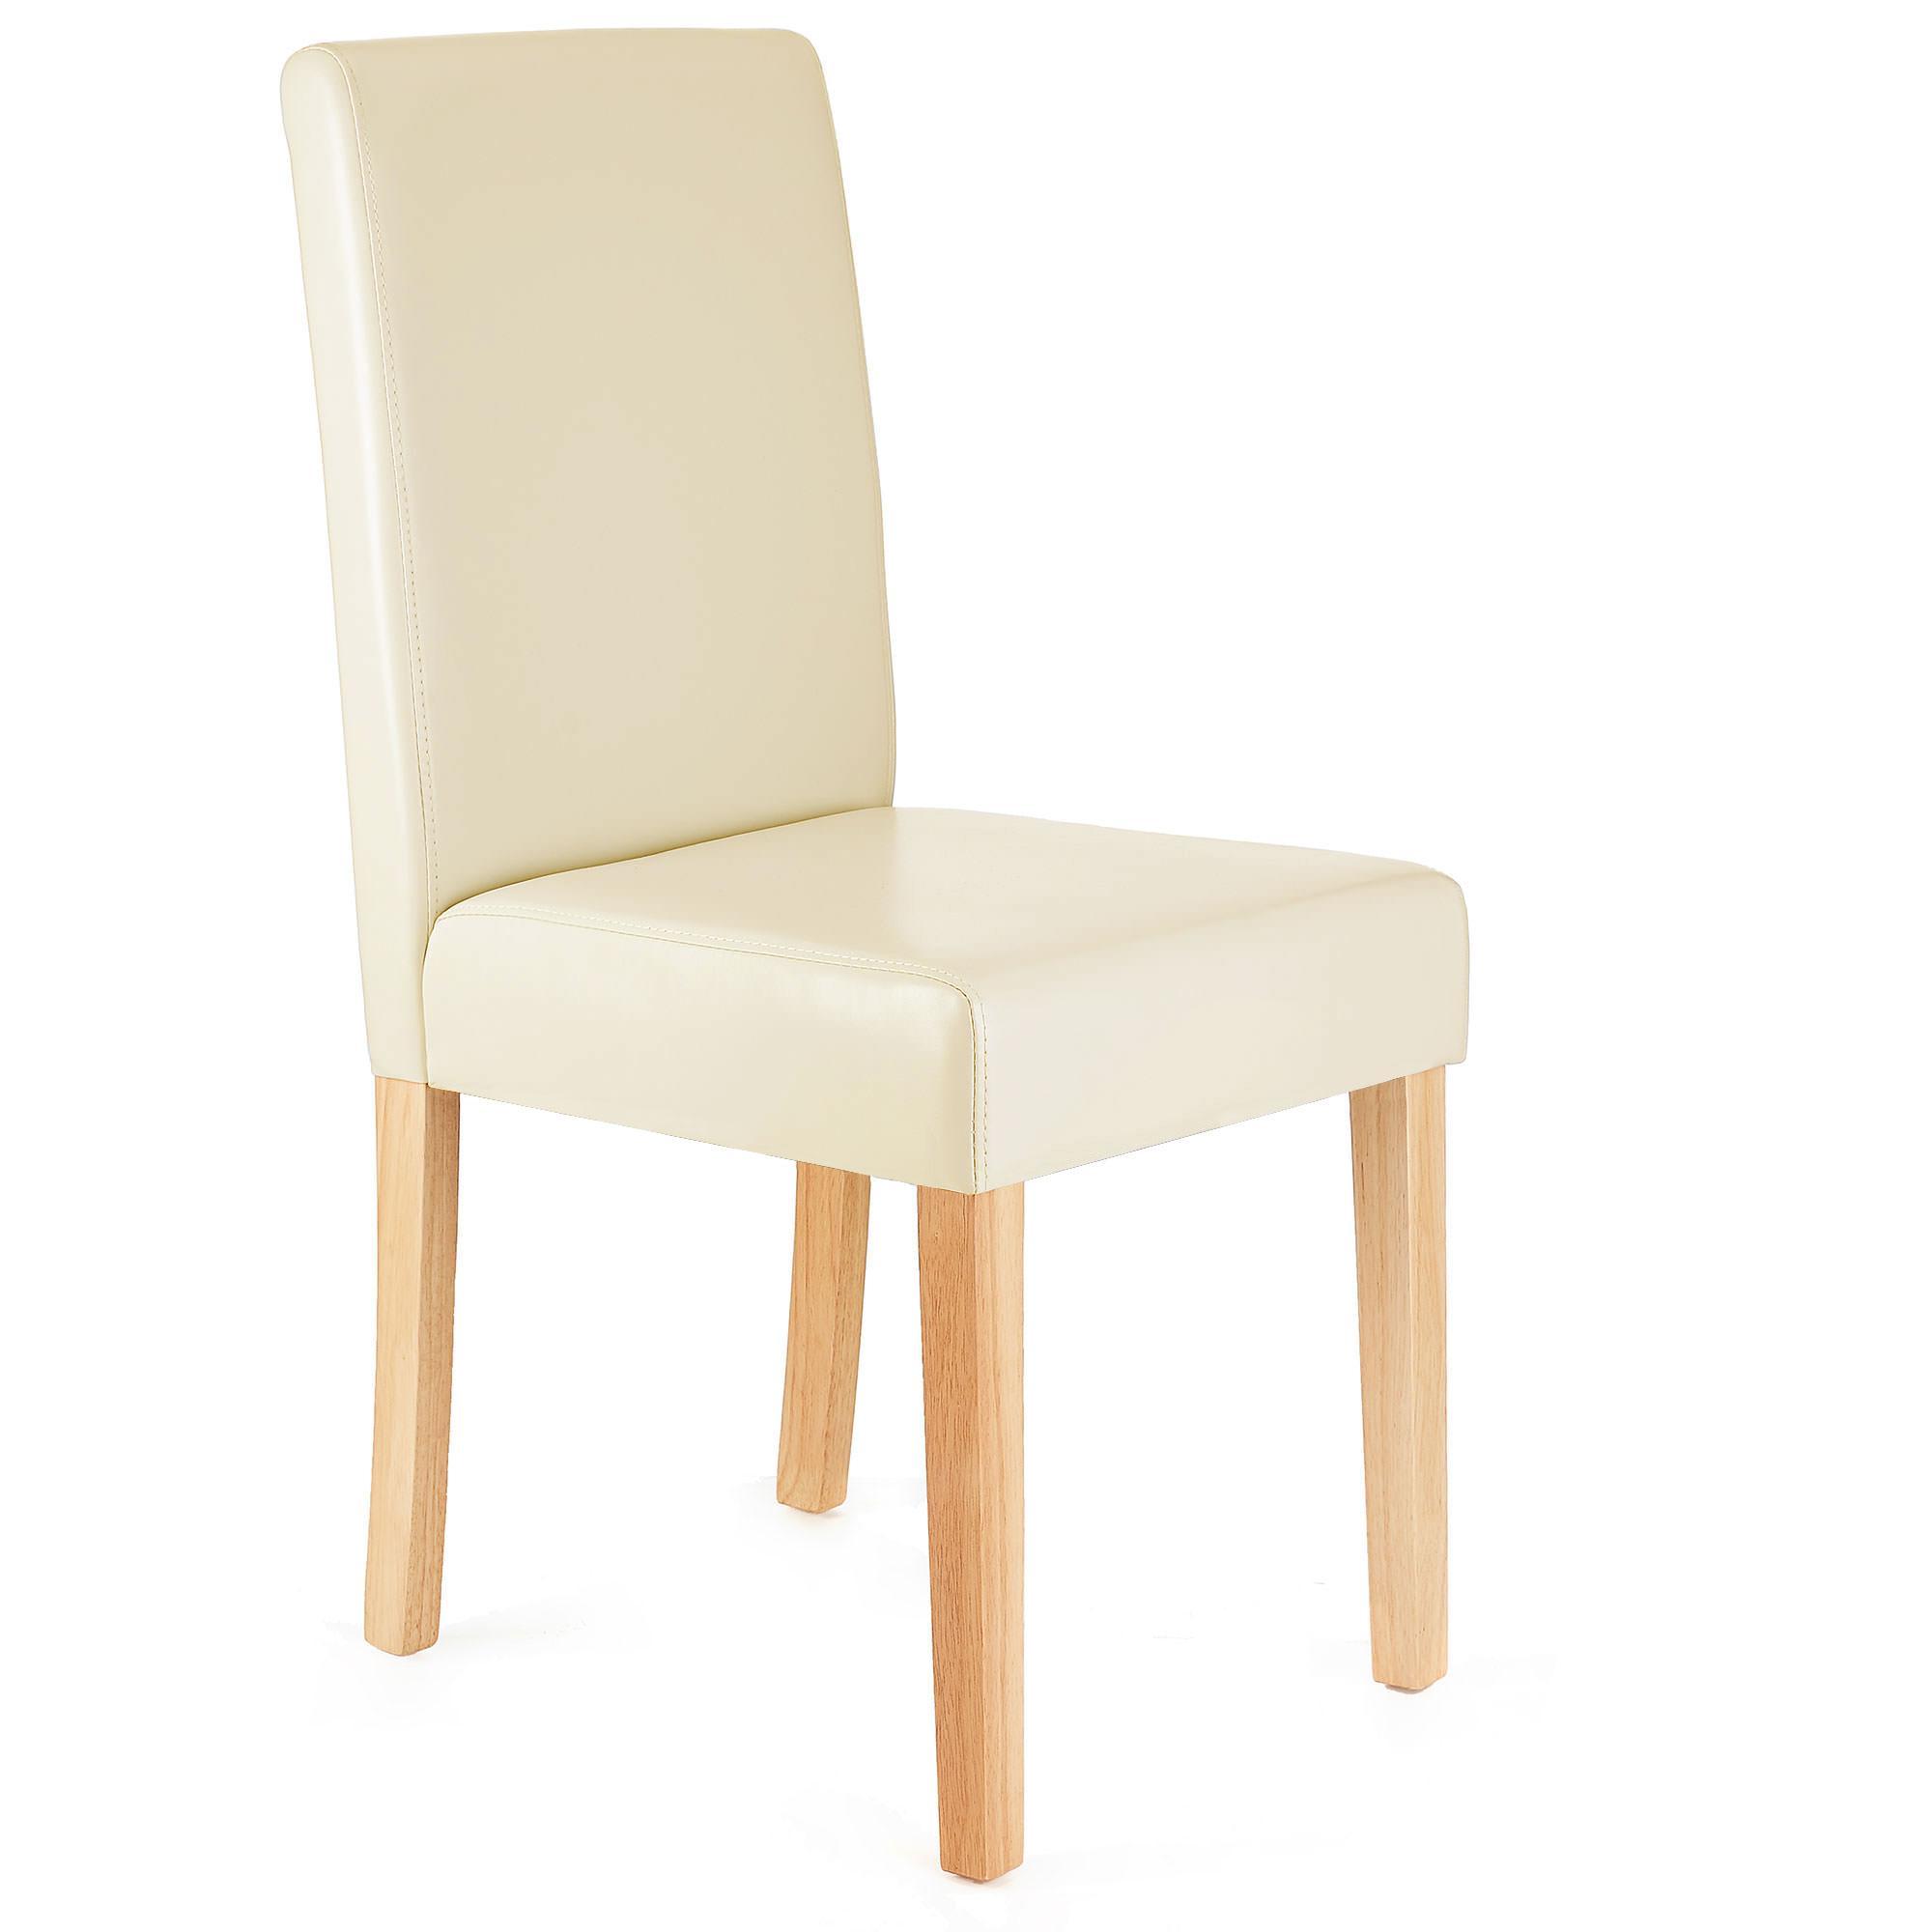 Conjunto de seis sillas cocina o comedor litau gran for Comedor 6 sillas precio